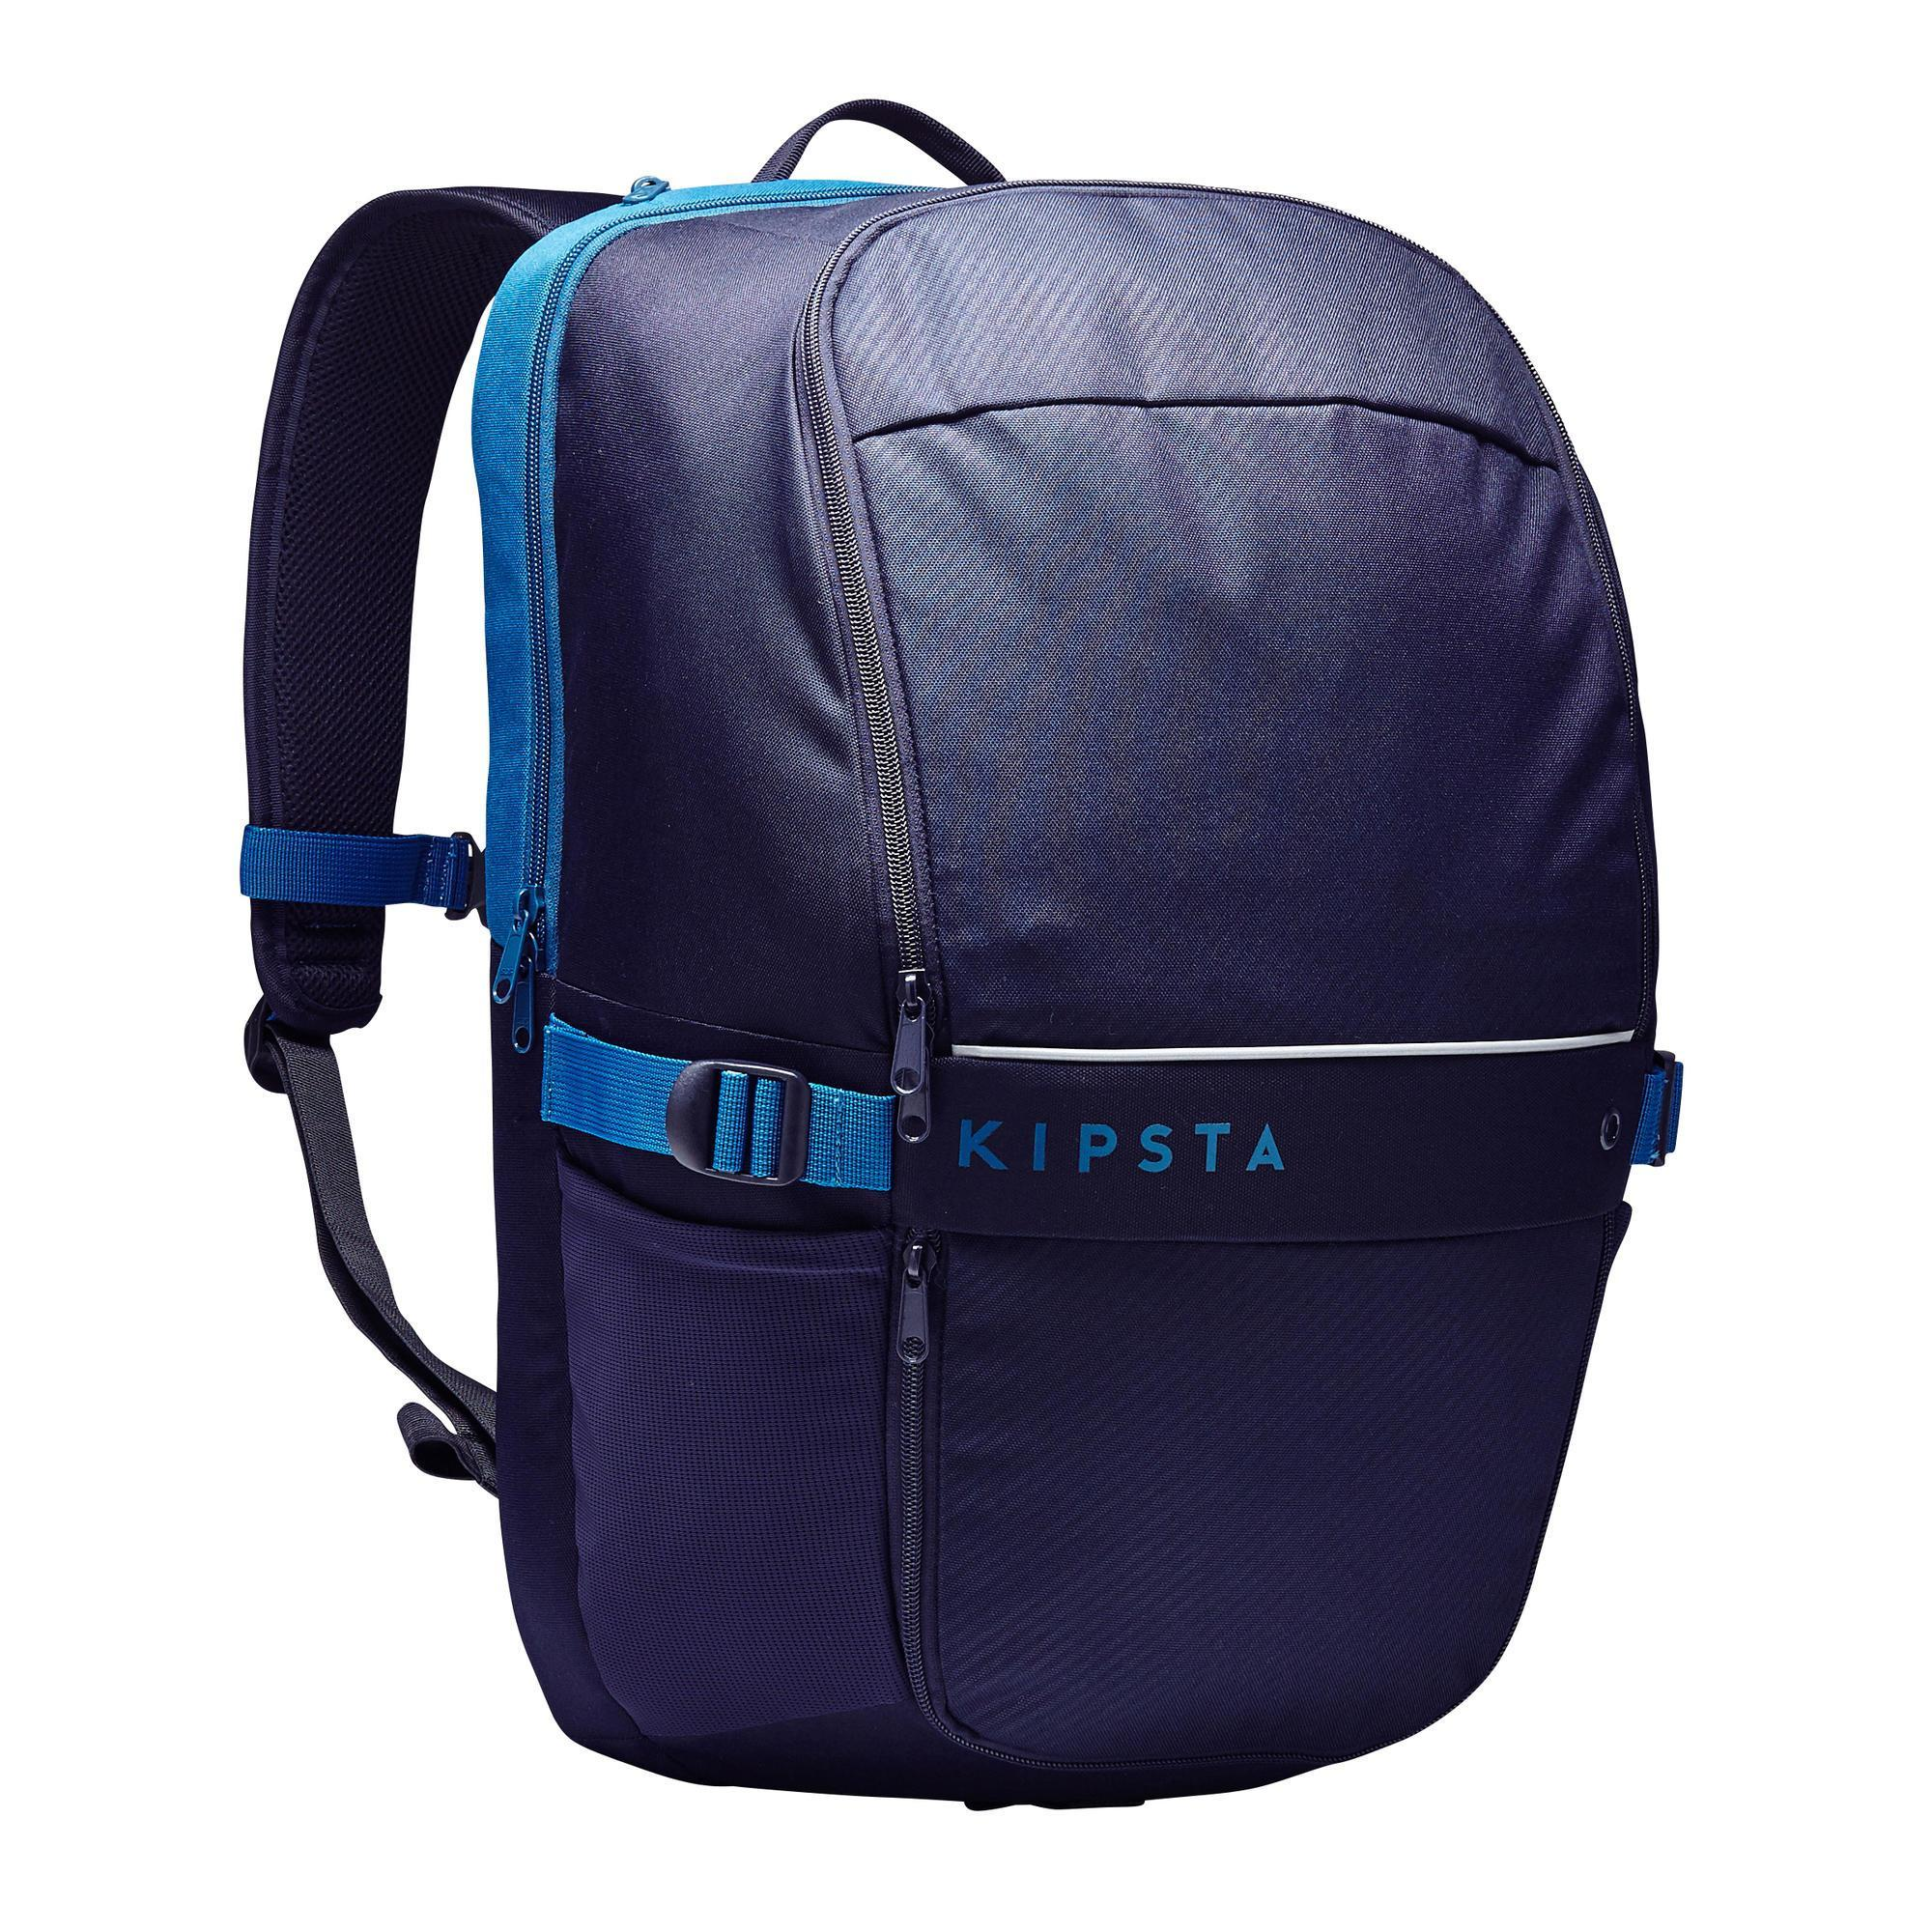 Kipsta Rugzak Classic 35 liter blauw